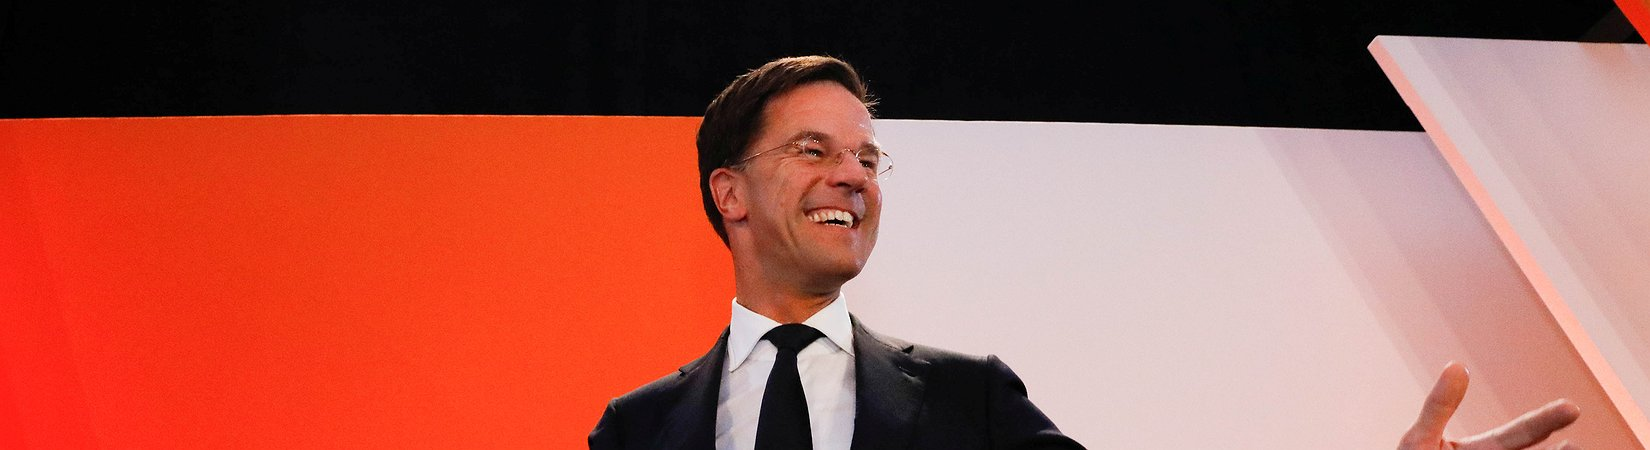 Holanda frena a la extrema derecha